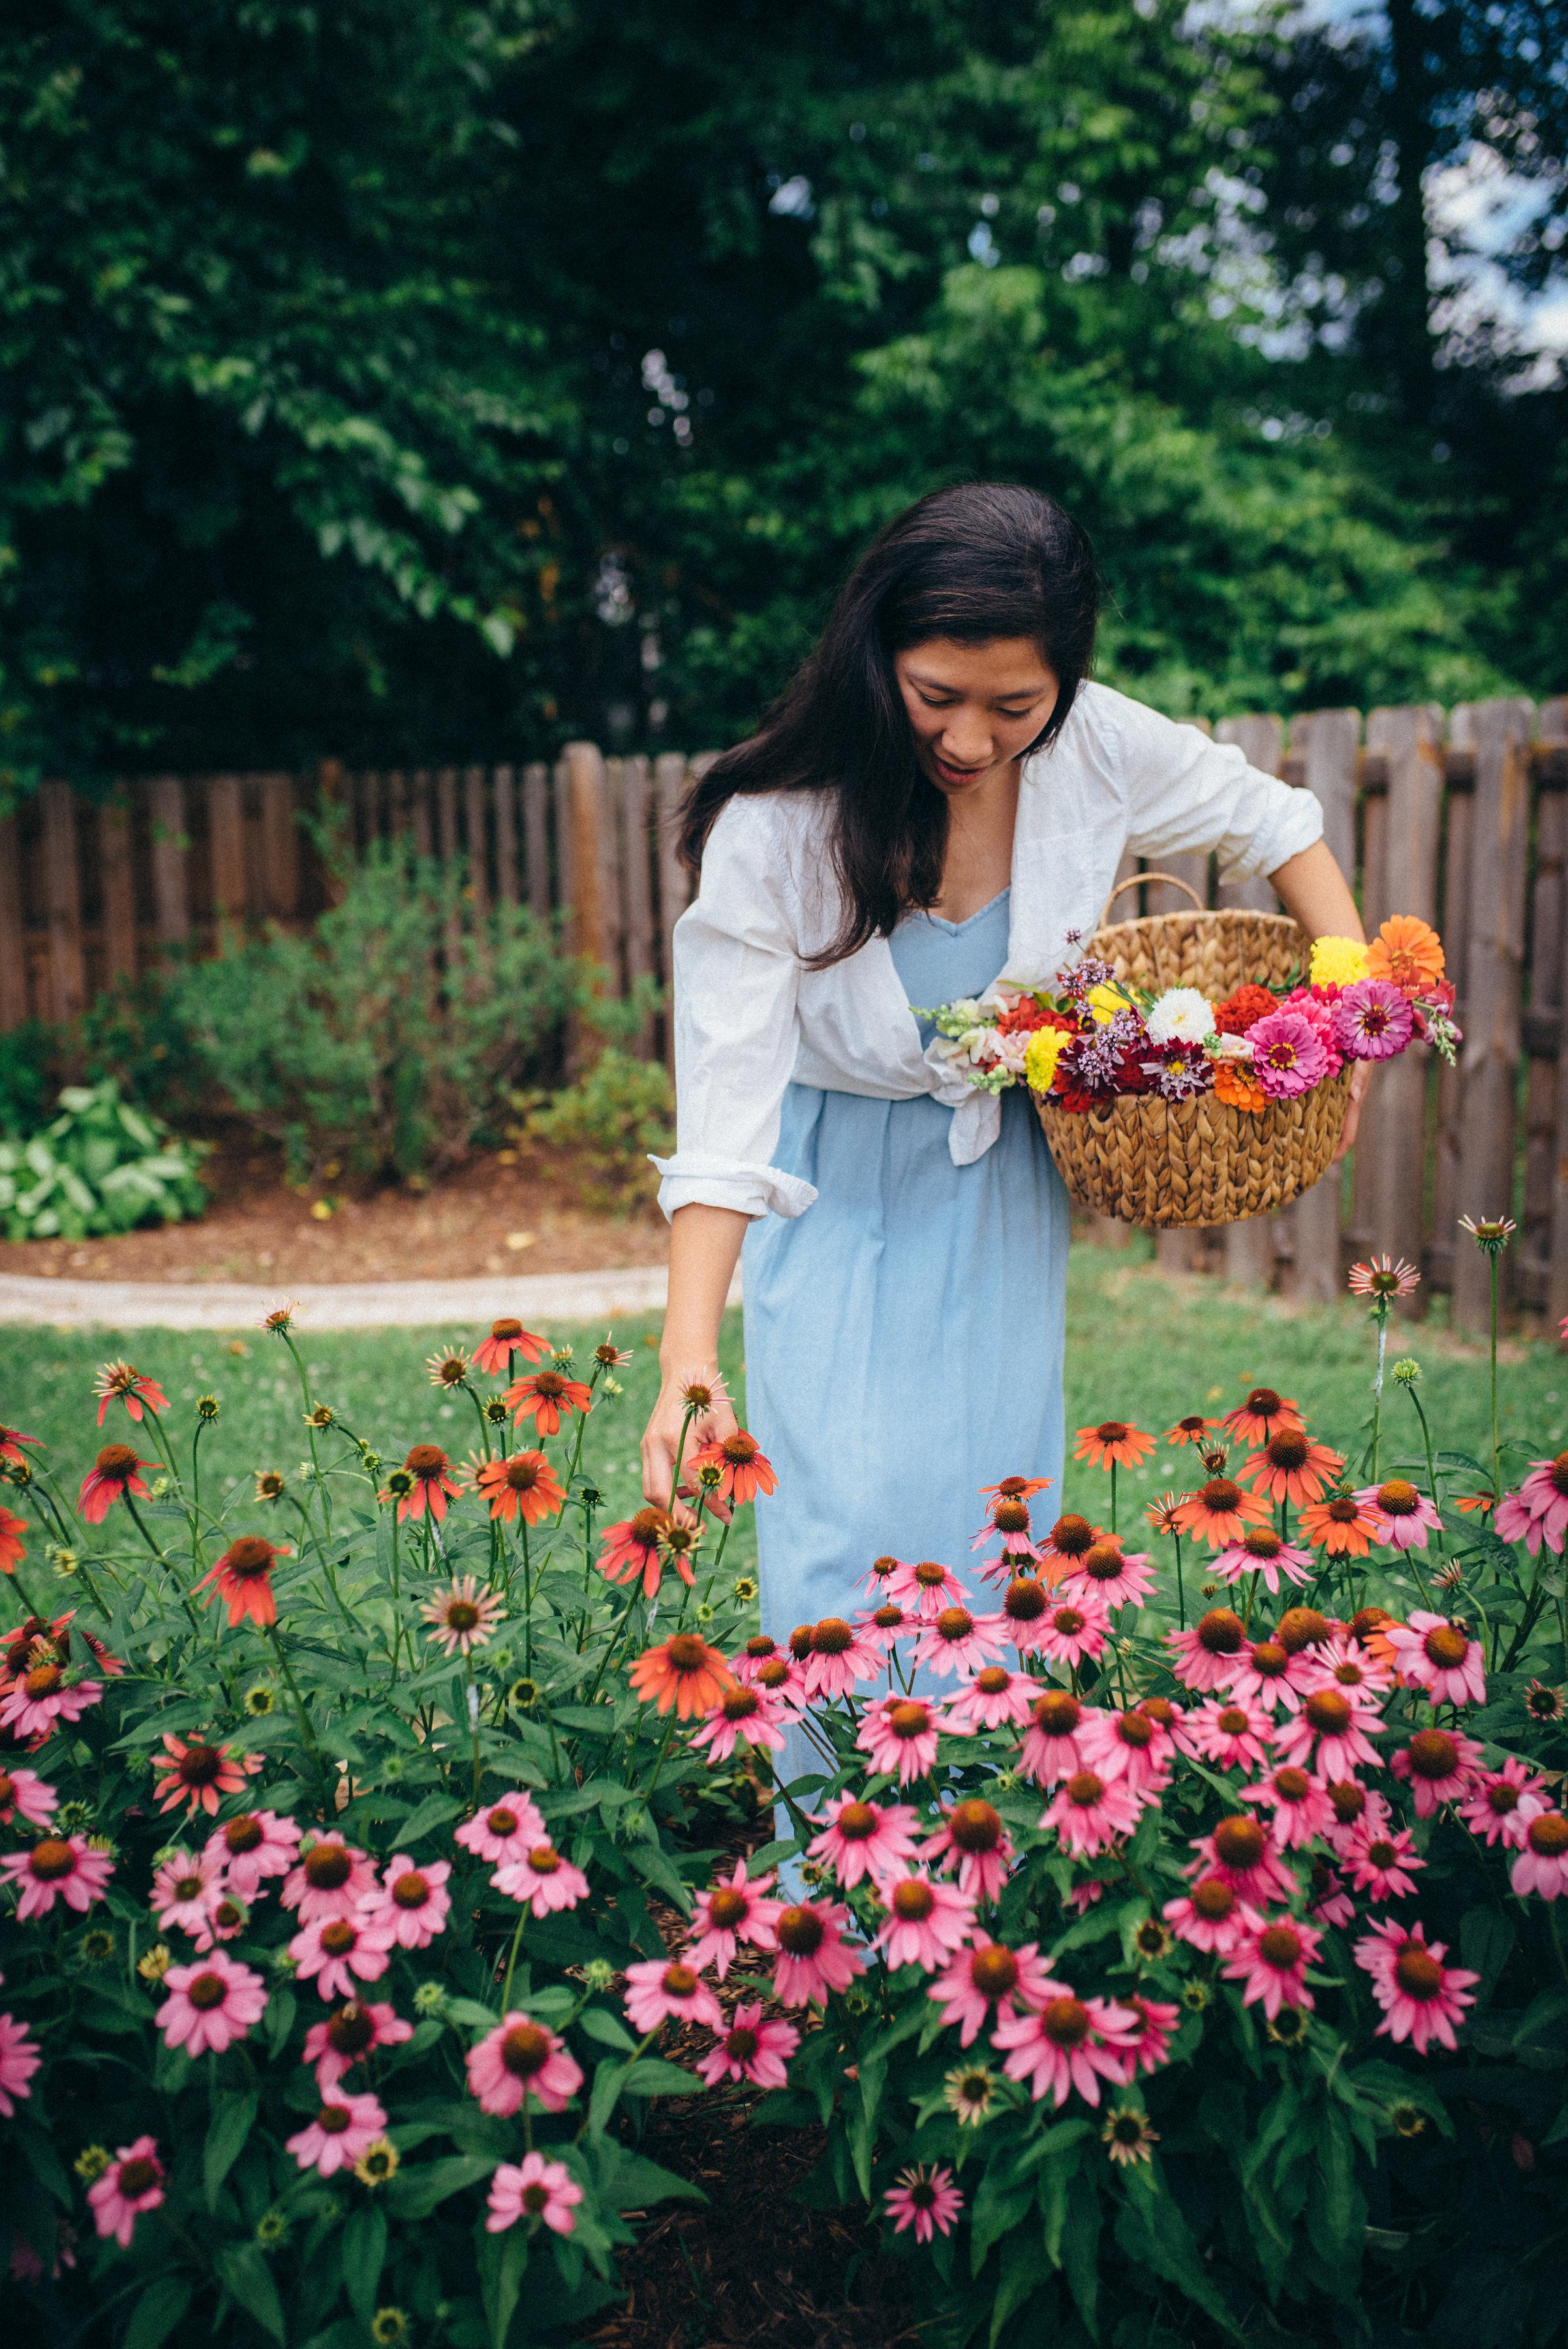 summer flowers - summer gardening tips - north carolina lifestyle blog